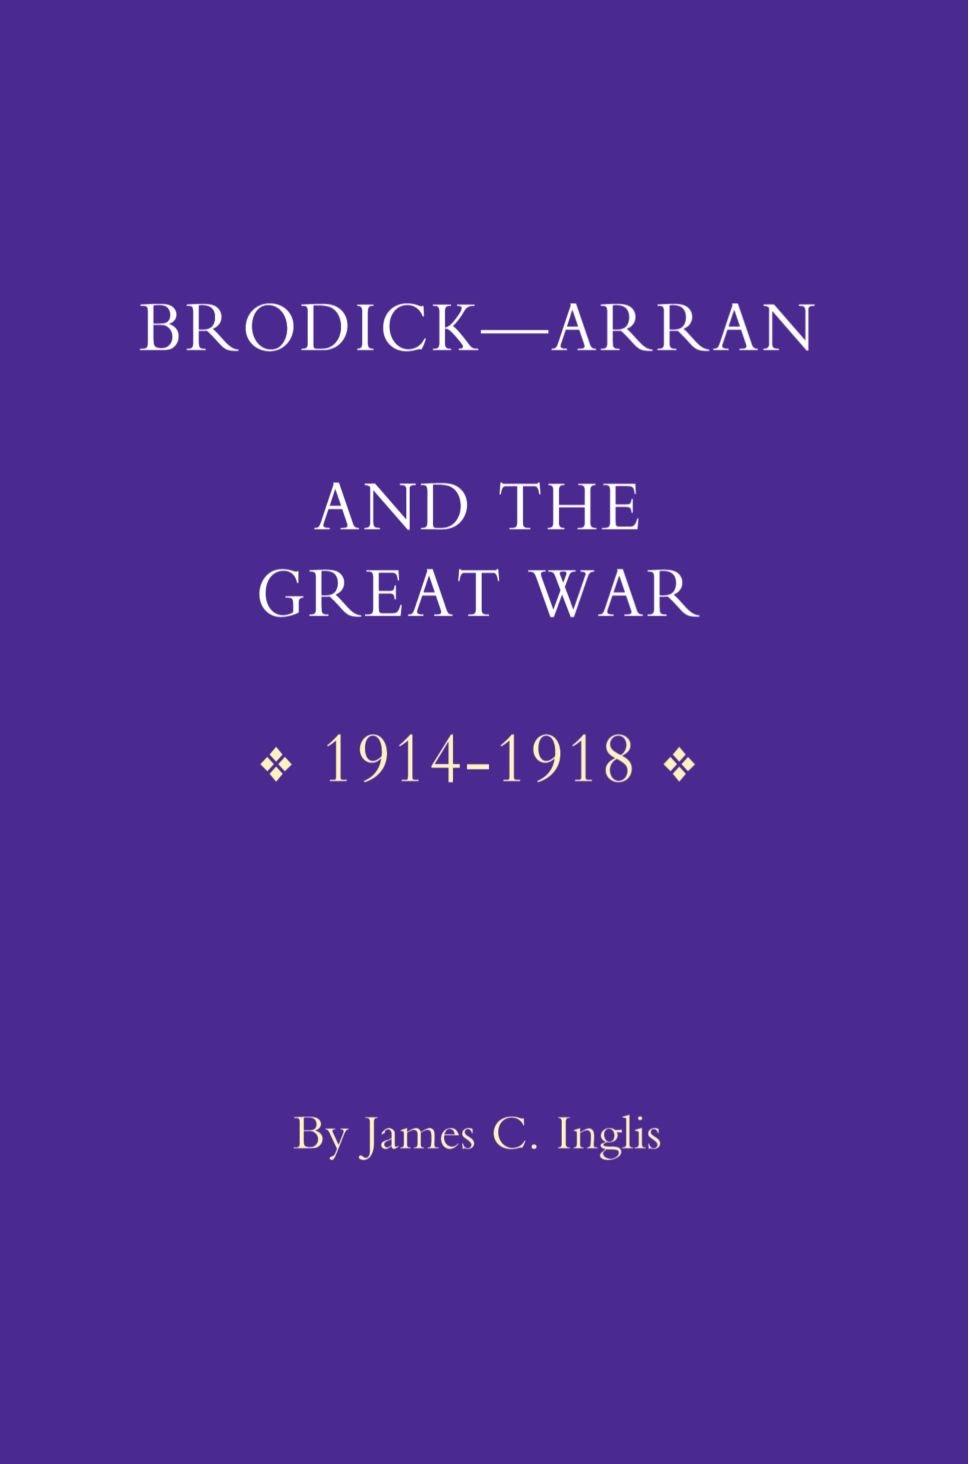 brodick arran and the great war inglis james c